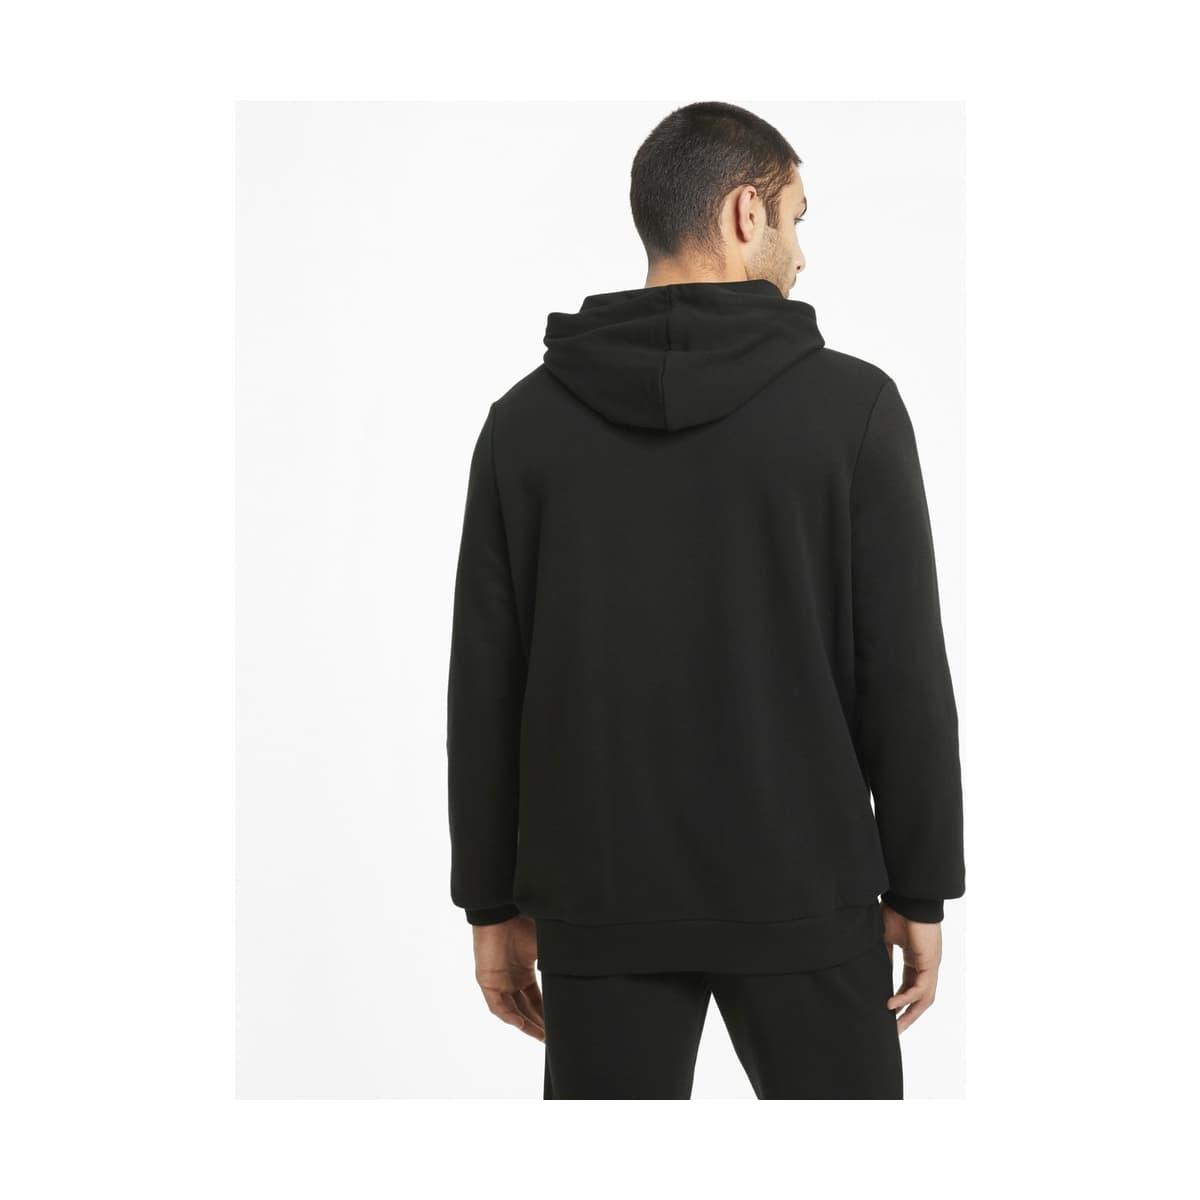 Essentials Big Logo Erkek Siyah Sweatshirt (586688-01)